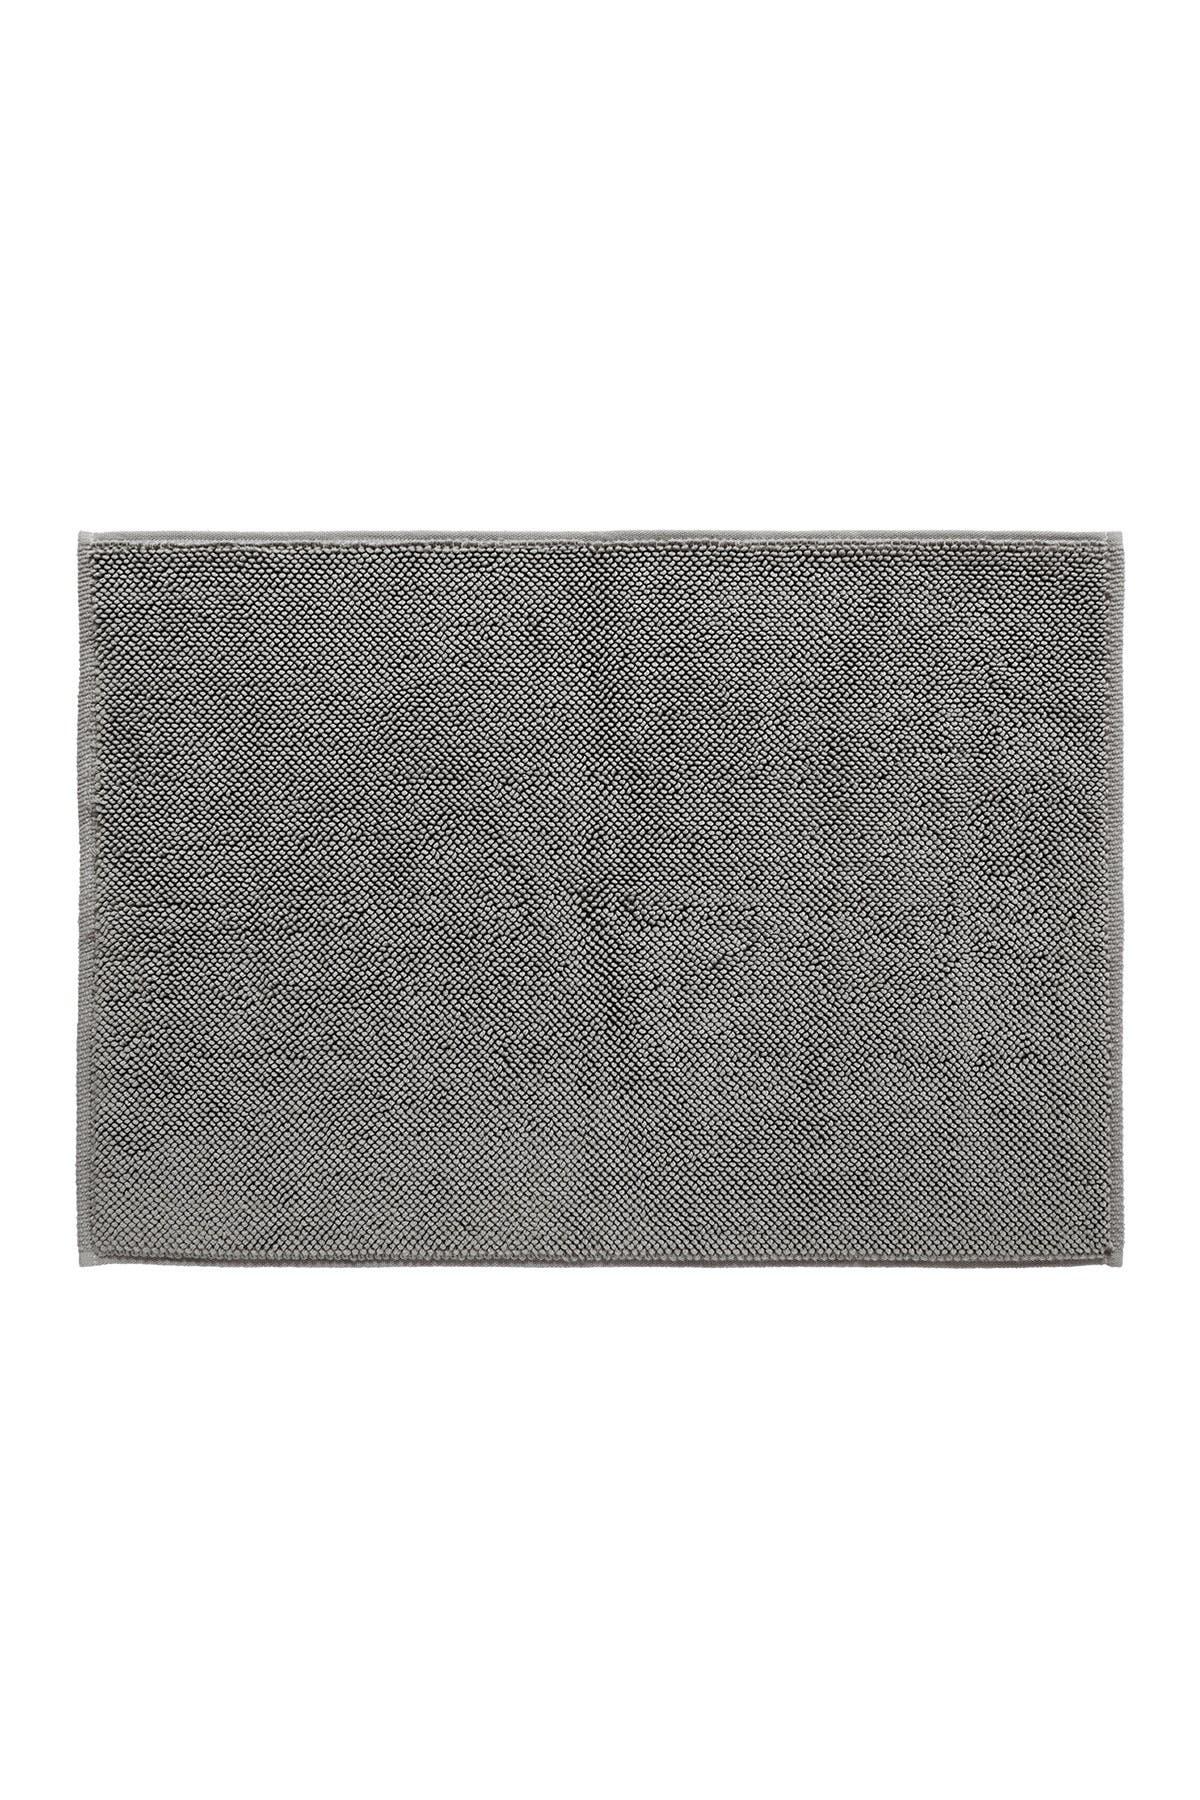 Image of Modern Threads Turkish Cotton Reversible Bath Rug - Grey